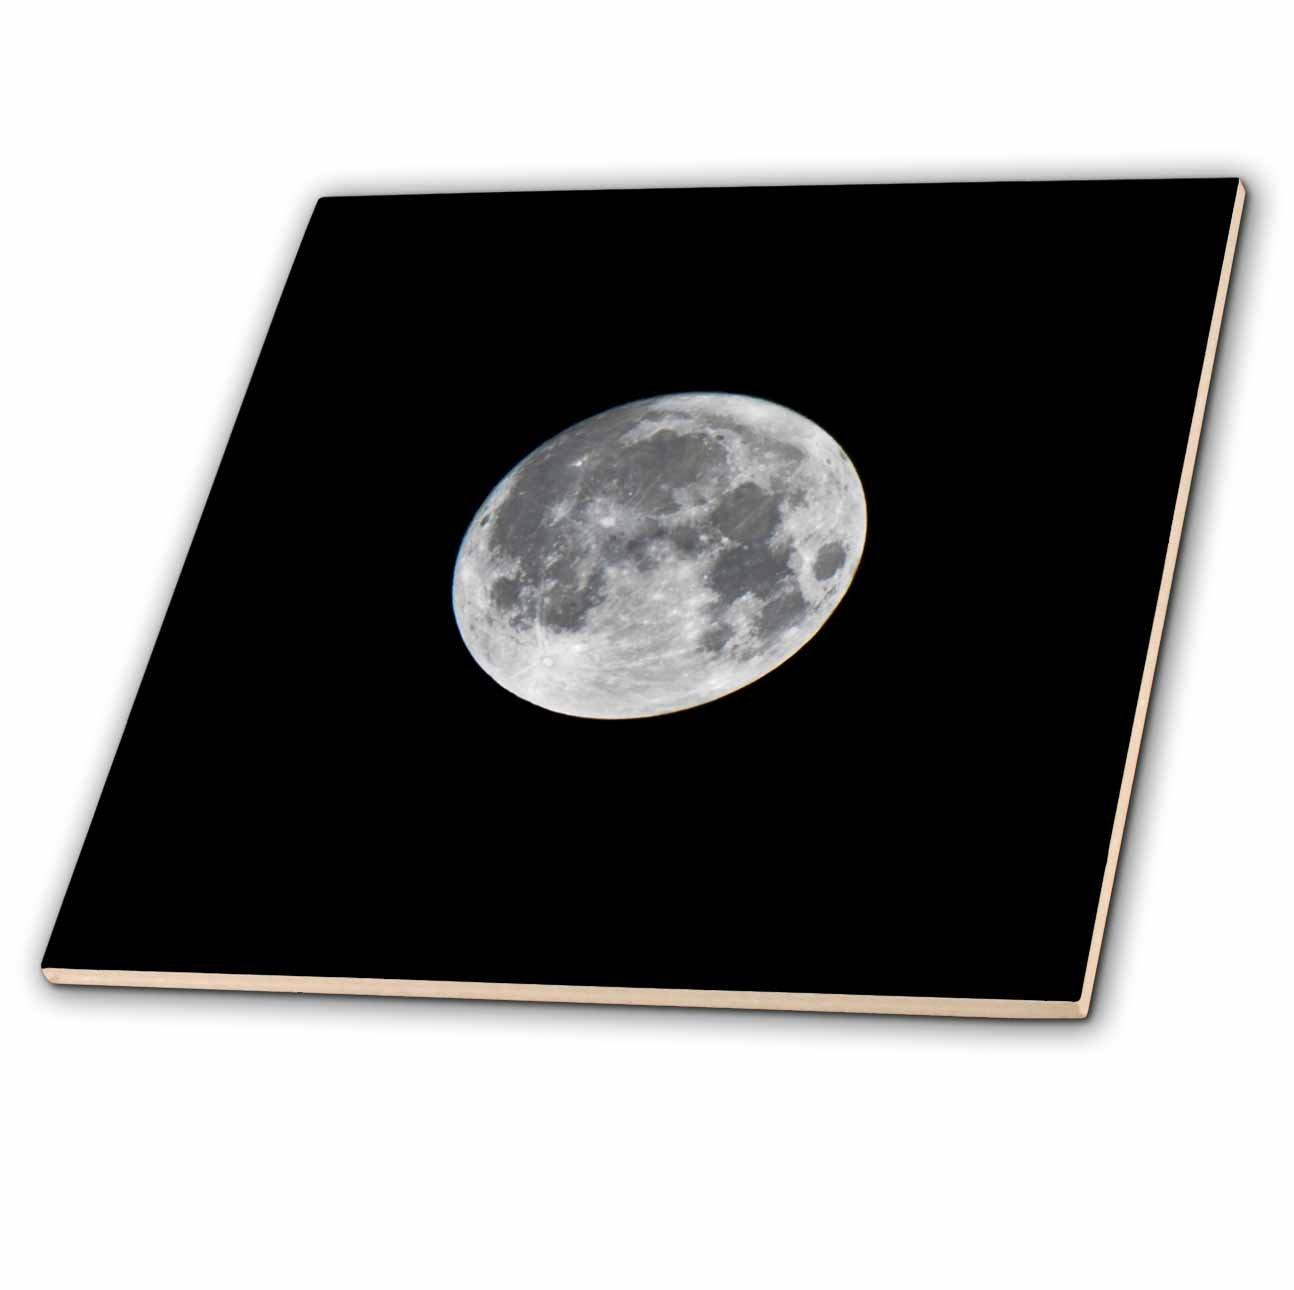 3dRose Danita Delimont - Moons - USA, Minnesota, Mendota Heights, Super Moon - 8 Inch Glass Tile (ct_279124_7)